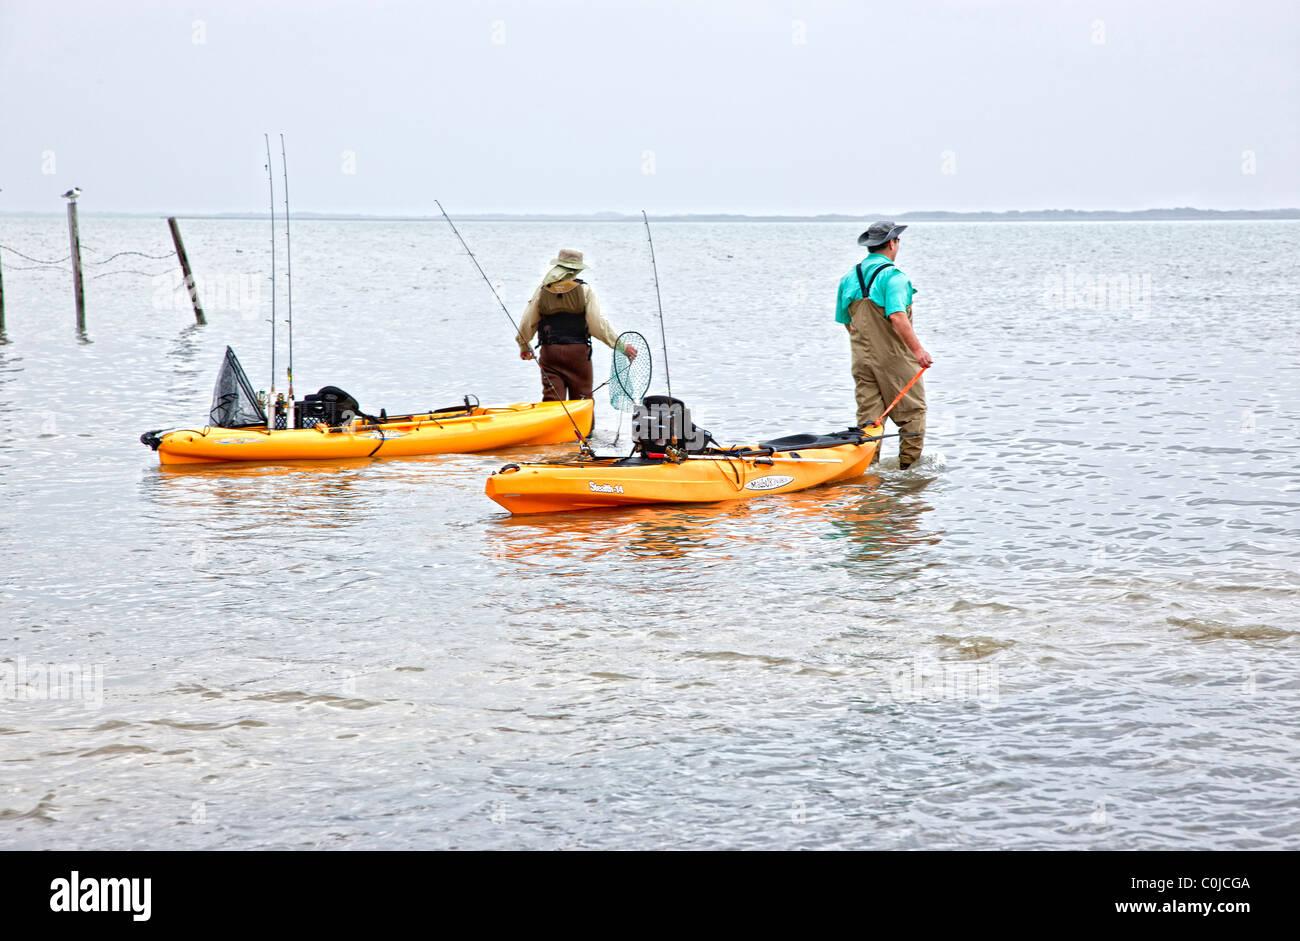 Fishermen launching kayaks, - Stock Image